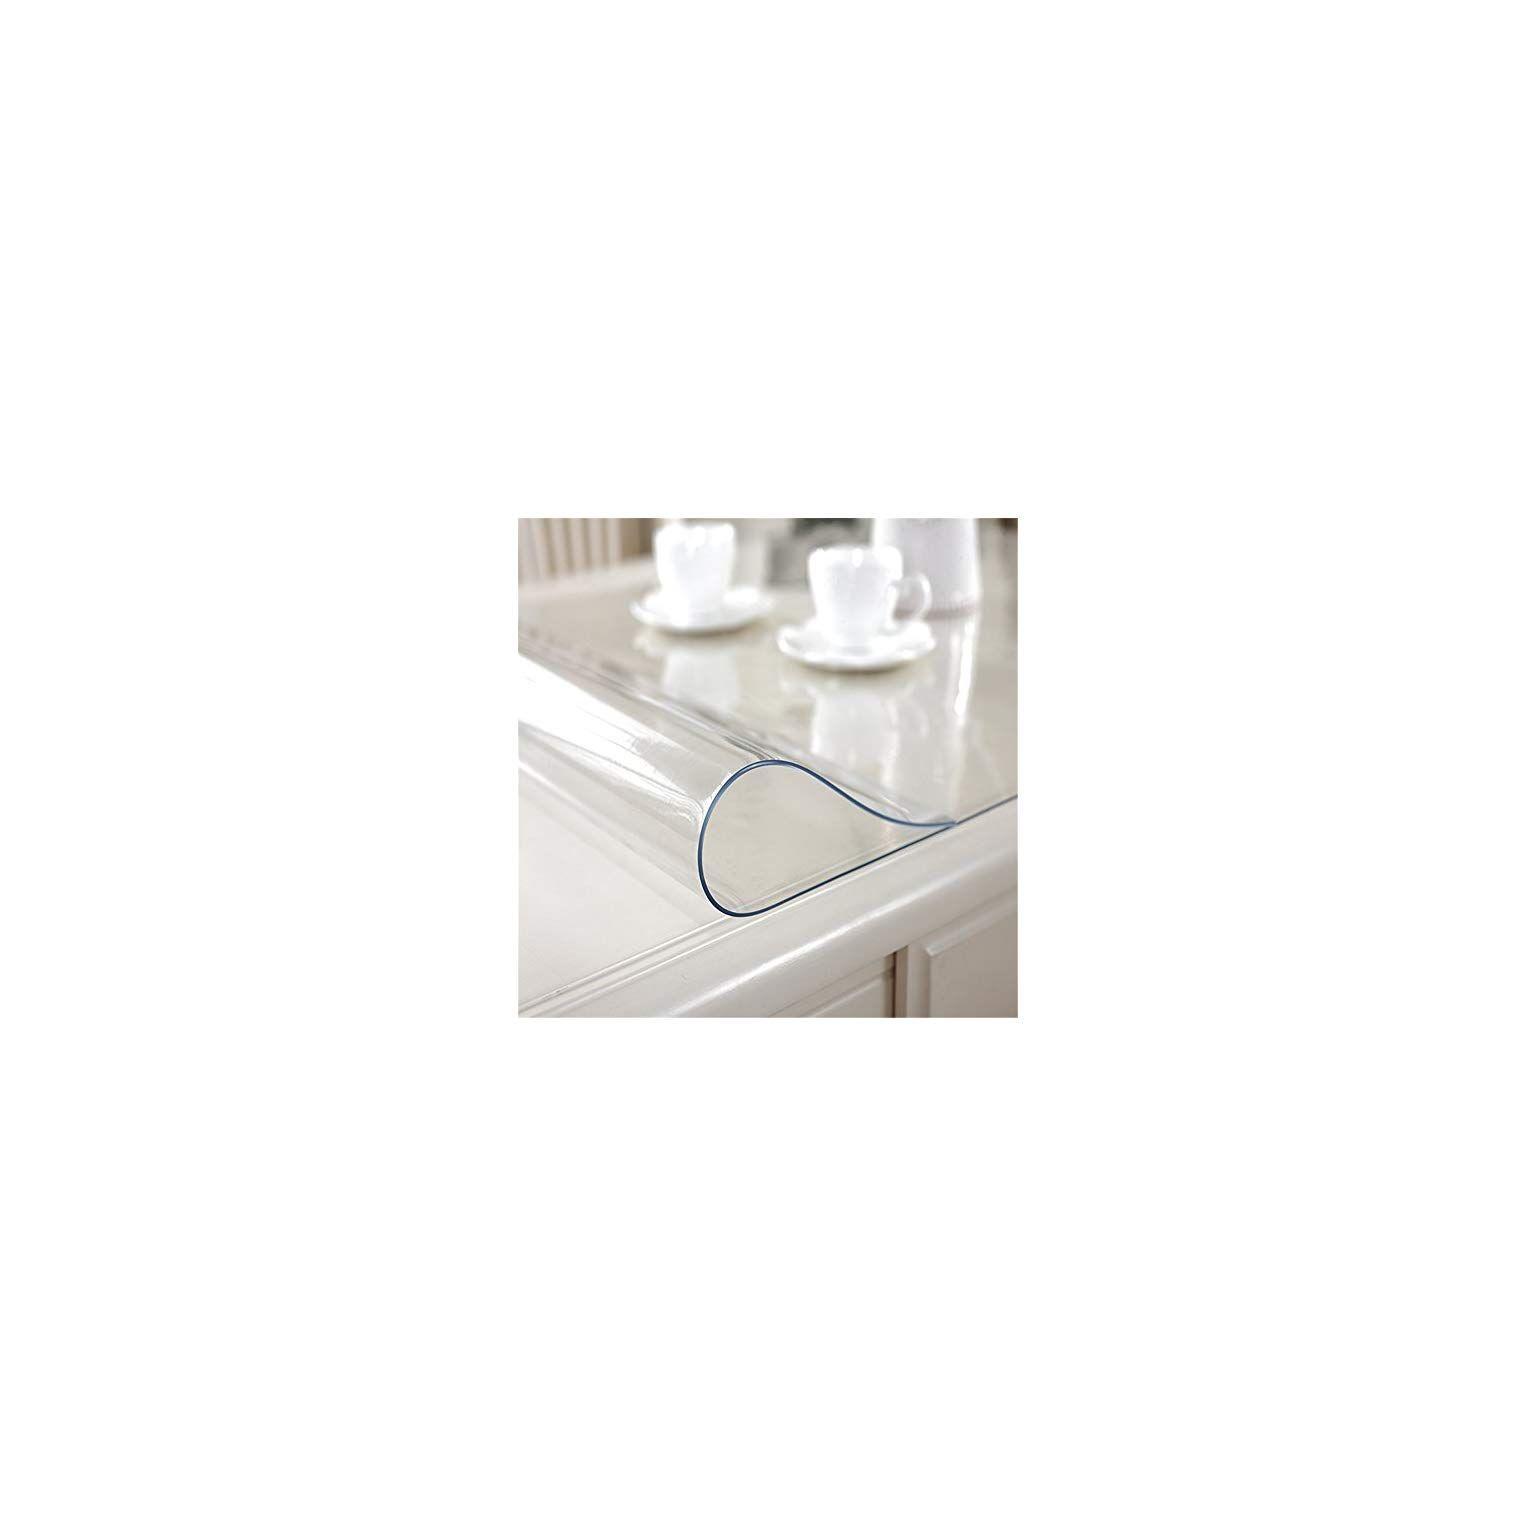 Ostepdecor Custom 72 X 27 6 Inch Clear Table Cover Protector 1 5